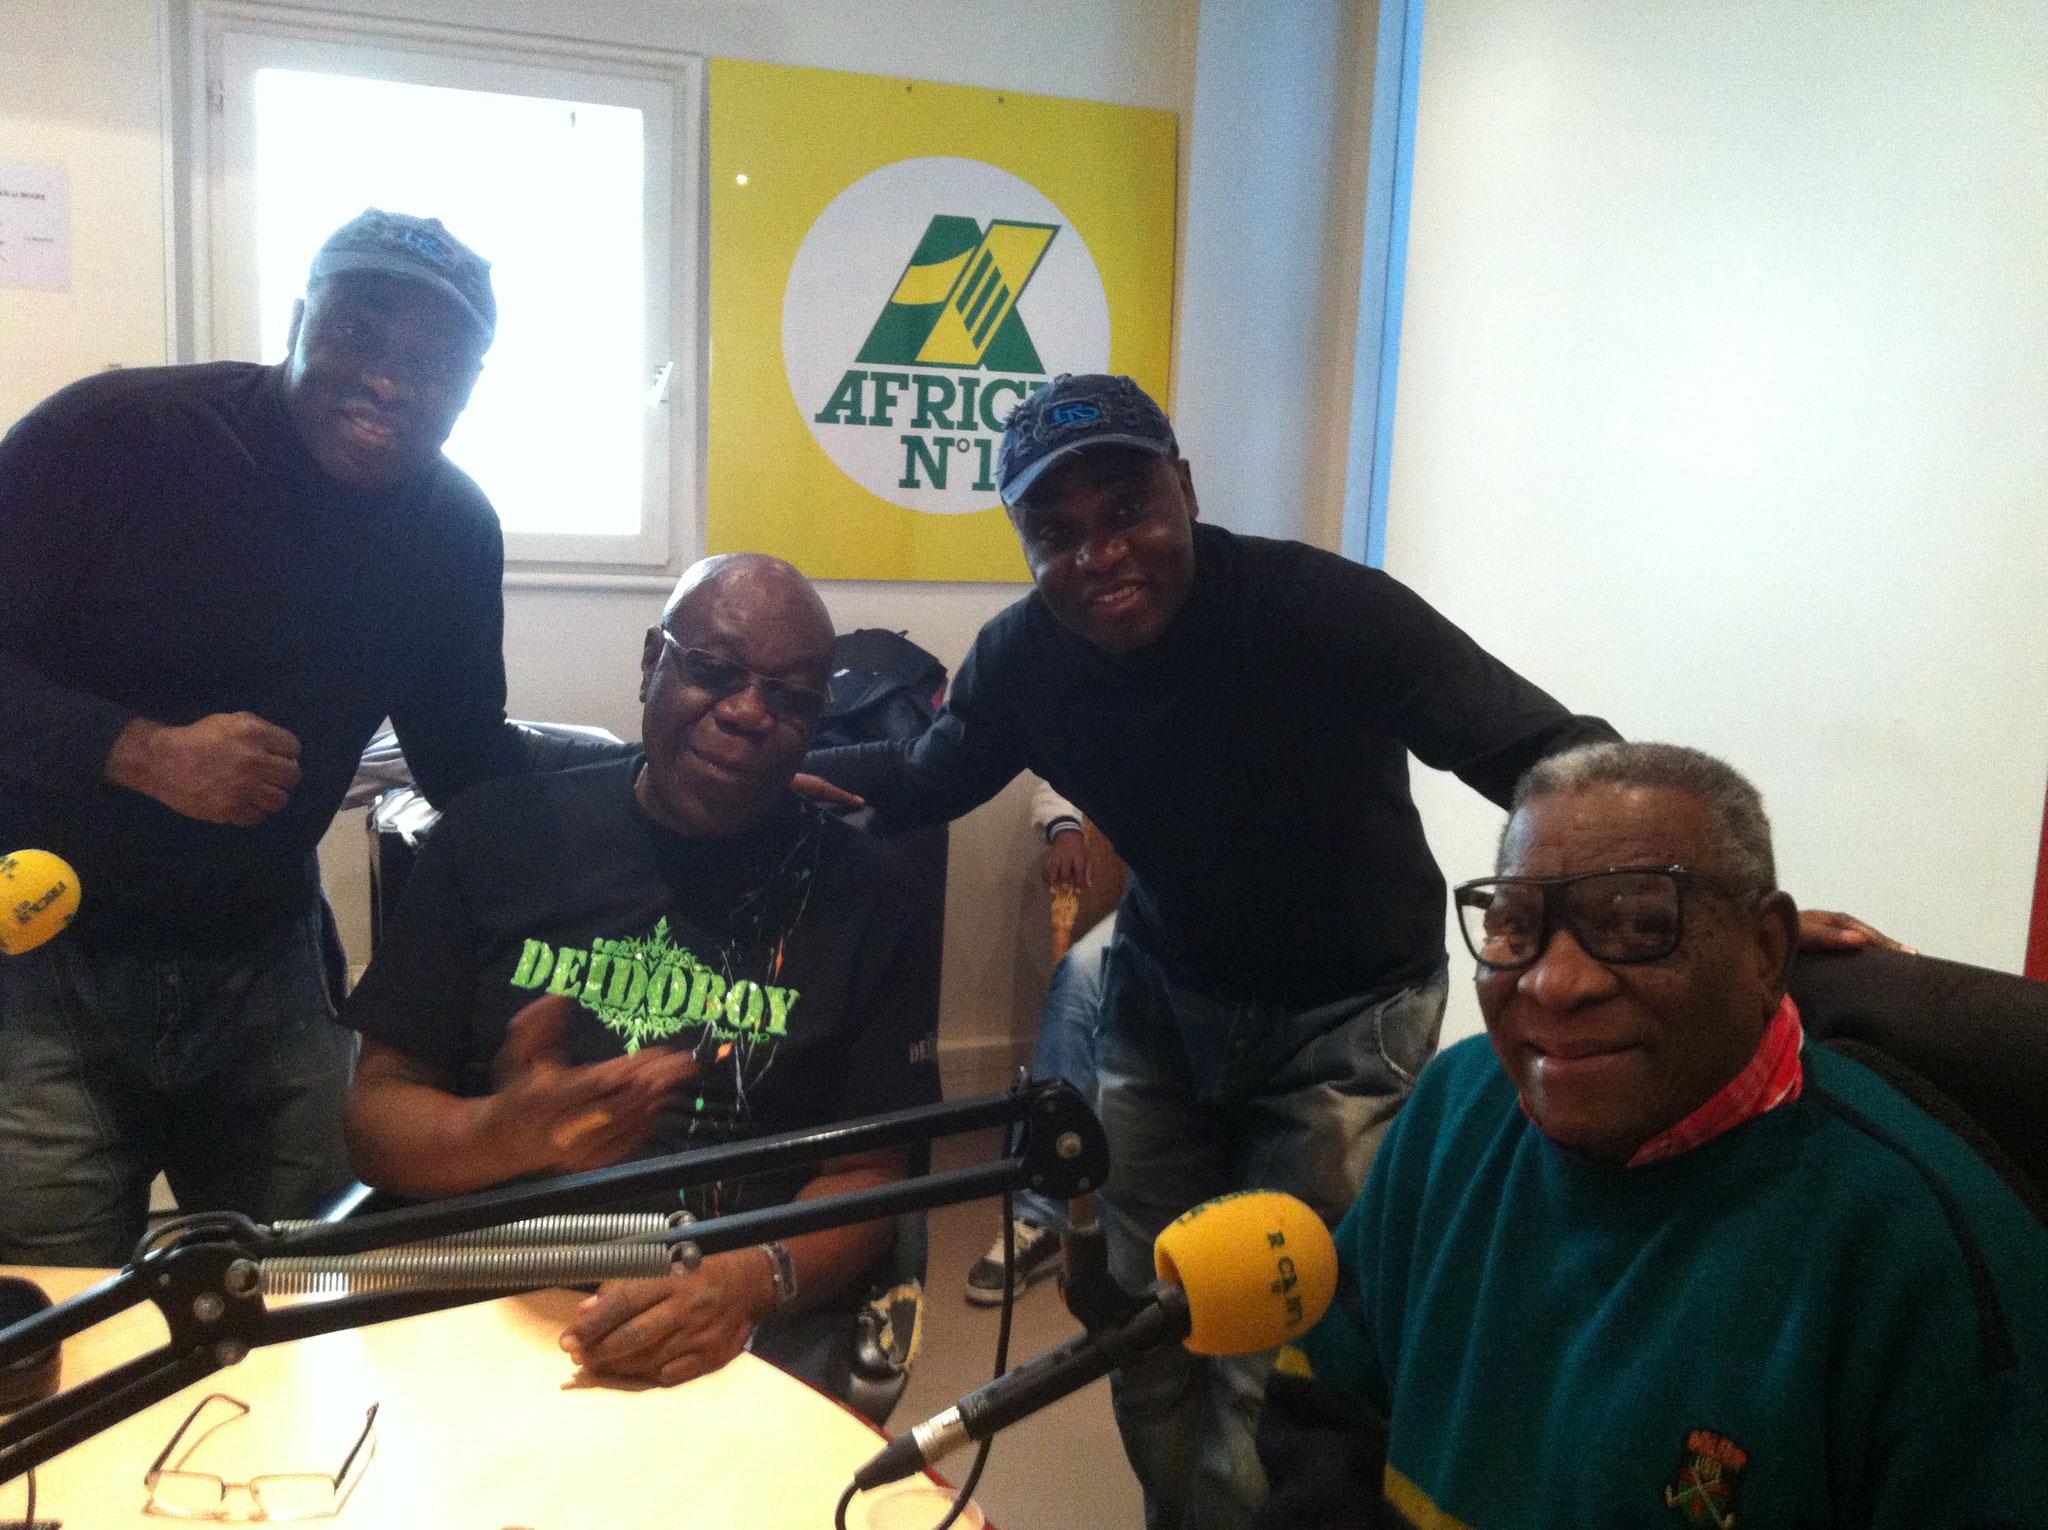 Les Jumeaux de MASAO (Masao Masu) during a radio broadcast with Manu Dibango and the Cuban trumpeter Ernesto Tito Puentes